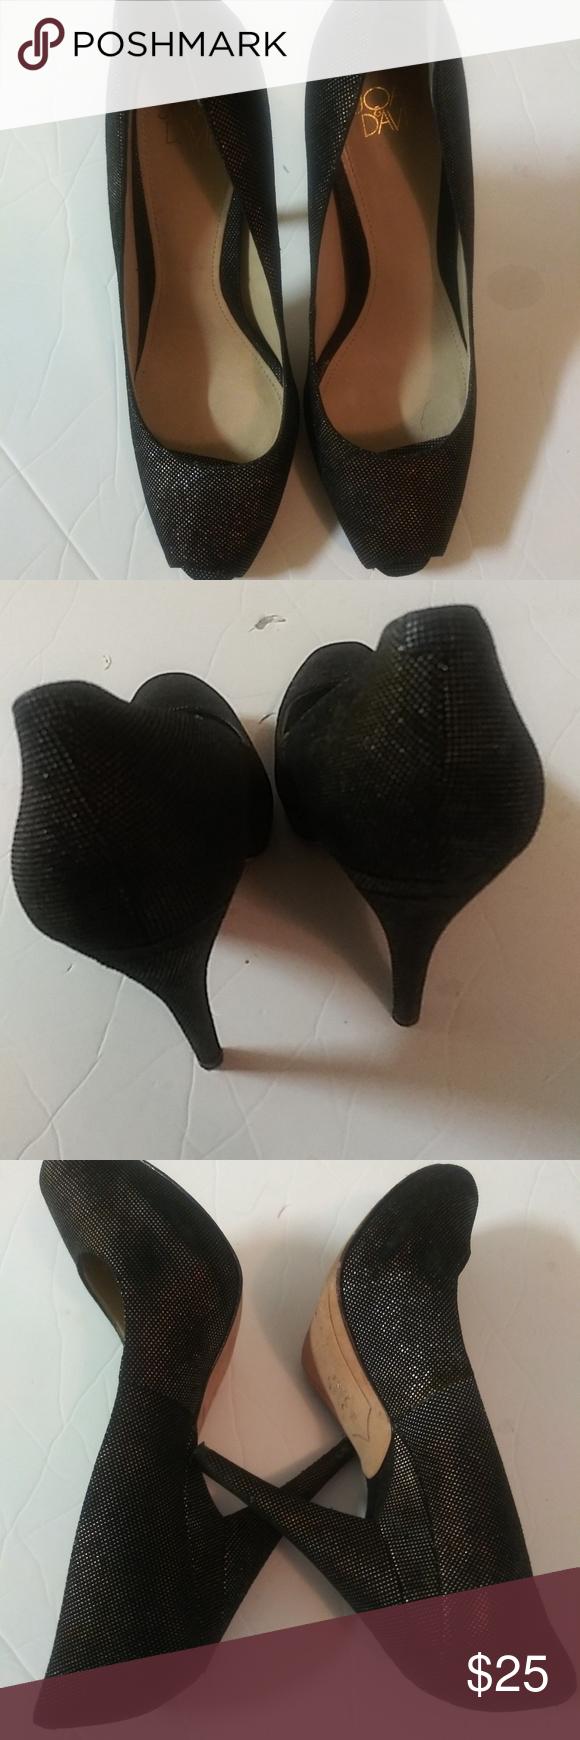 Black Heels Size 7M   Joan and david